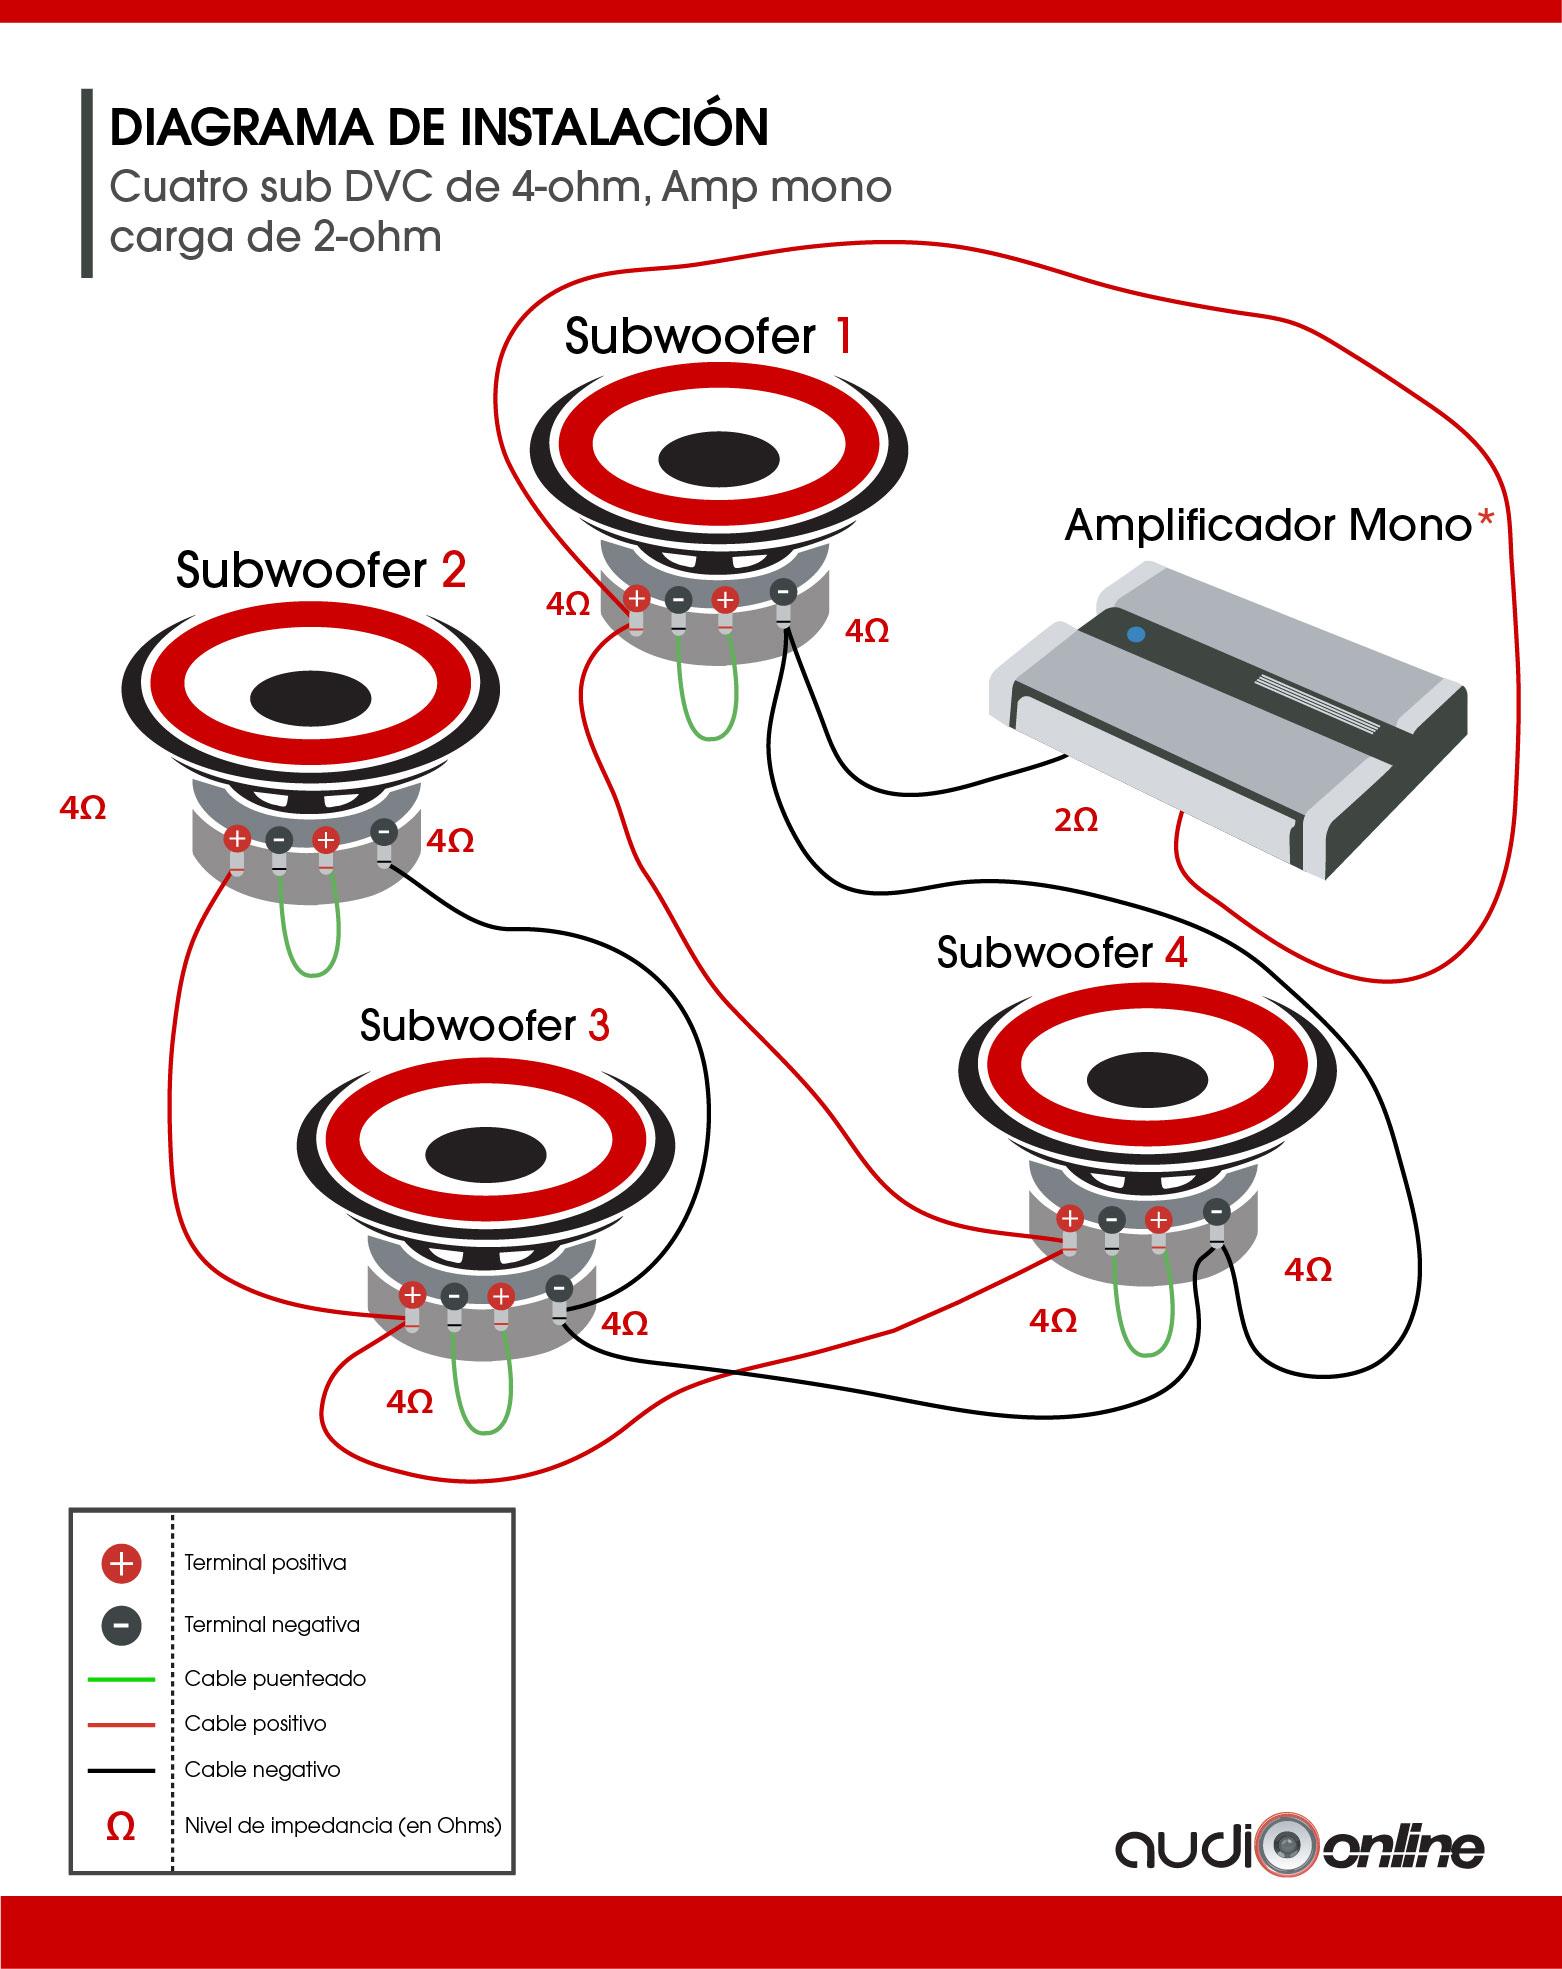 mono amp 2, 4x12 speaker cabinet, crutchfield amp, on 2 ohm dvc wiring diagram crutchfield